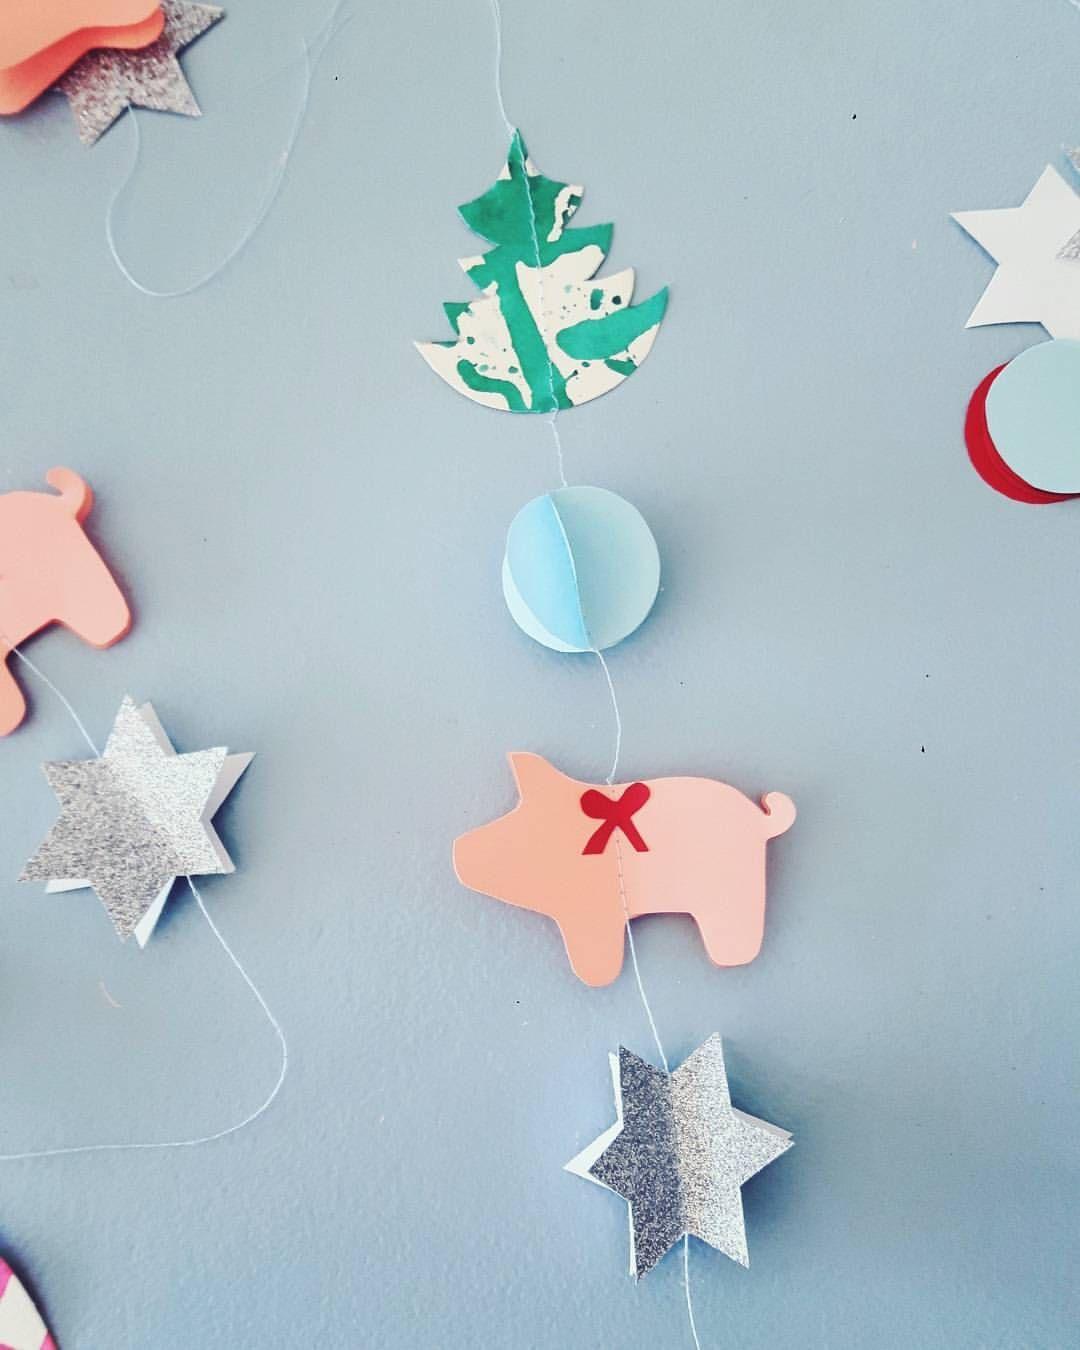 "@barewunderbar på Instagram: ""⭕ Har haft en super hyggelig dag hvor jeg har leget med papir med en sød veninde  #julepynt #barewunderbarjul #vinterhygge #papirklip"""